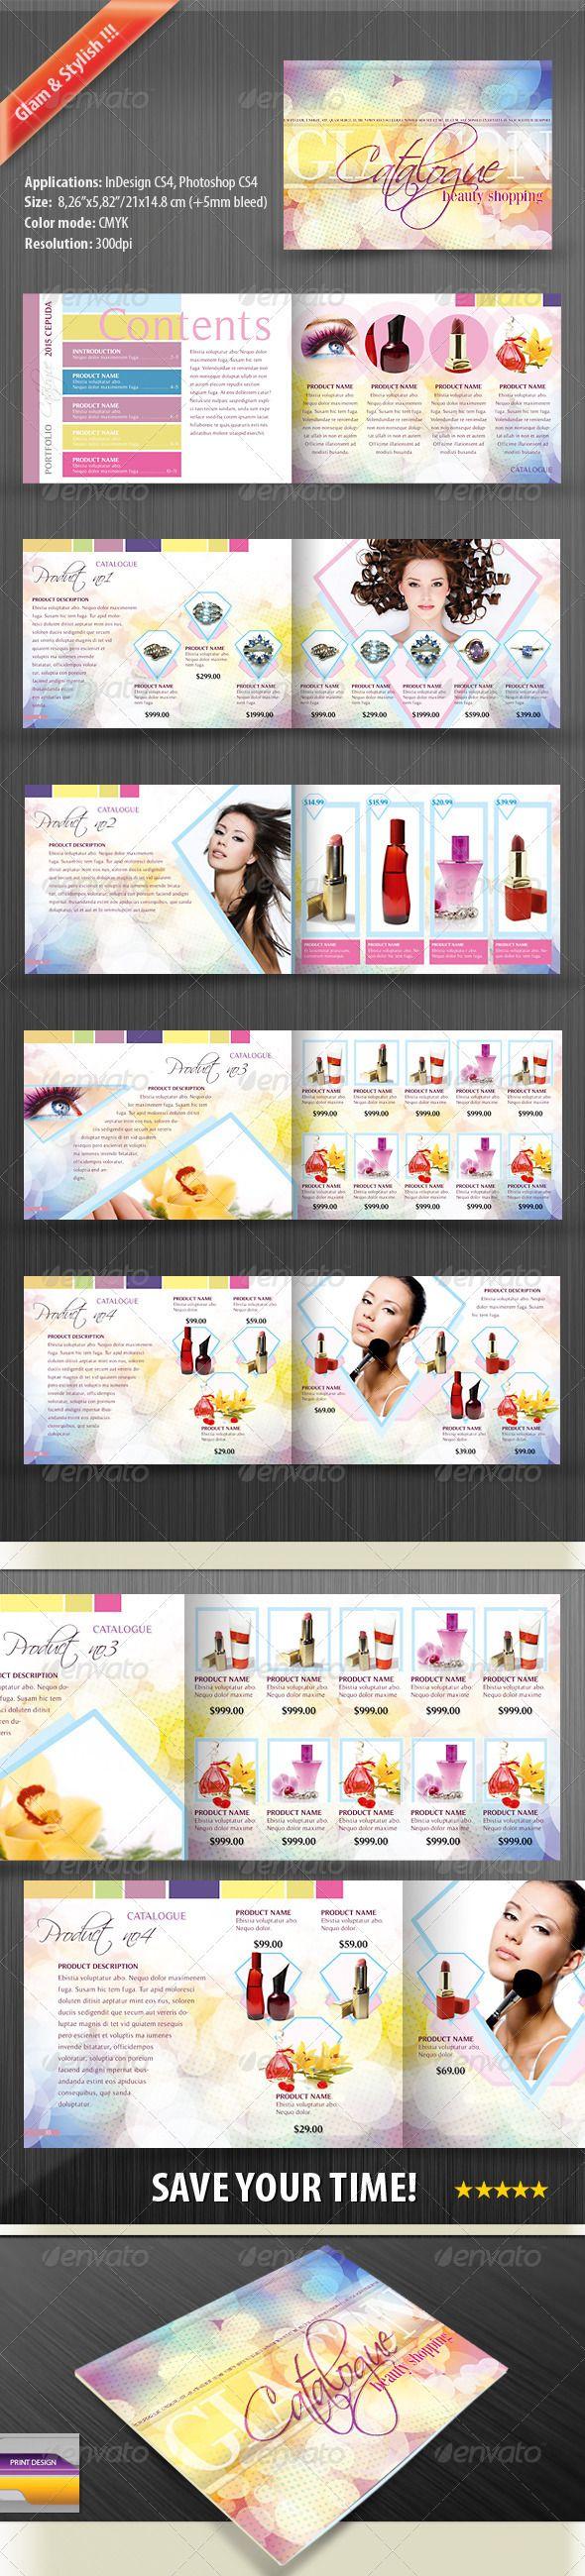 25+ best Product catalog design ideas on Pinterest | Product ...